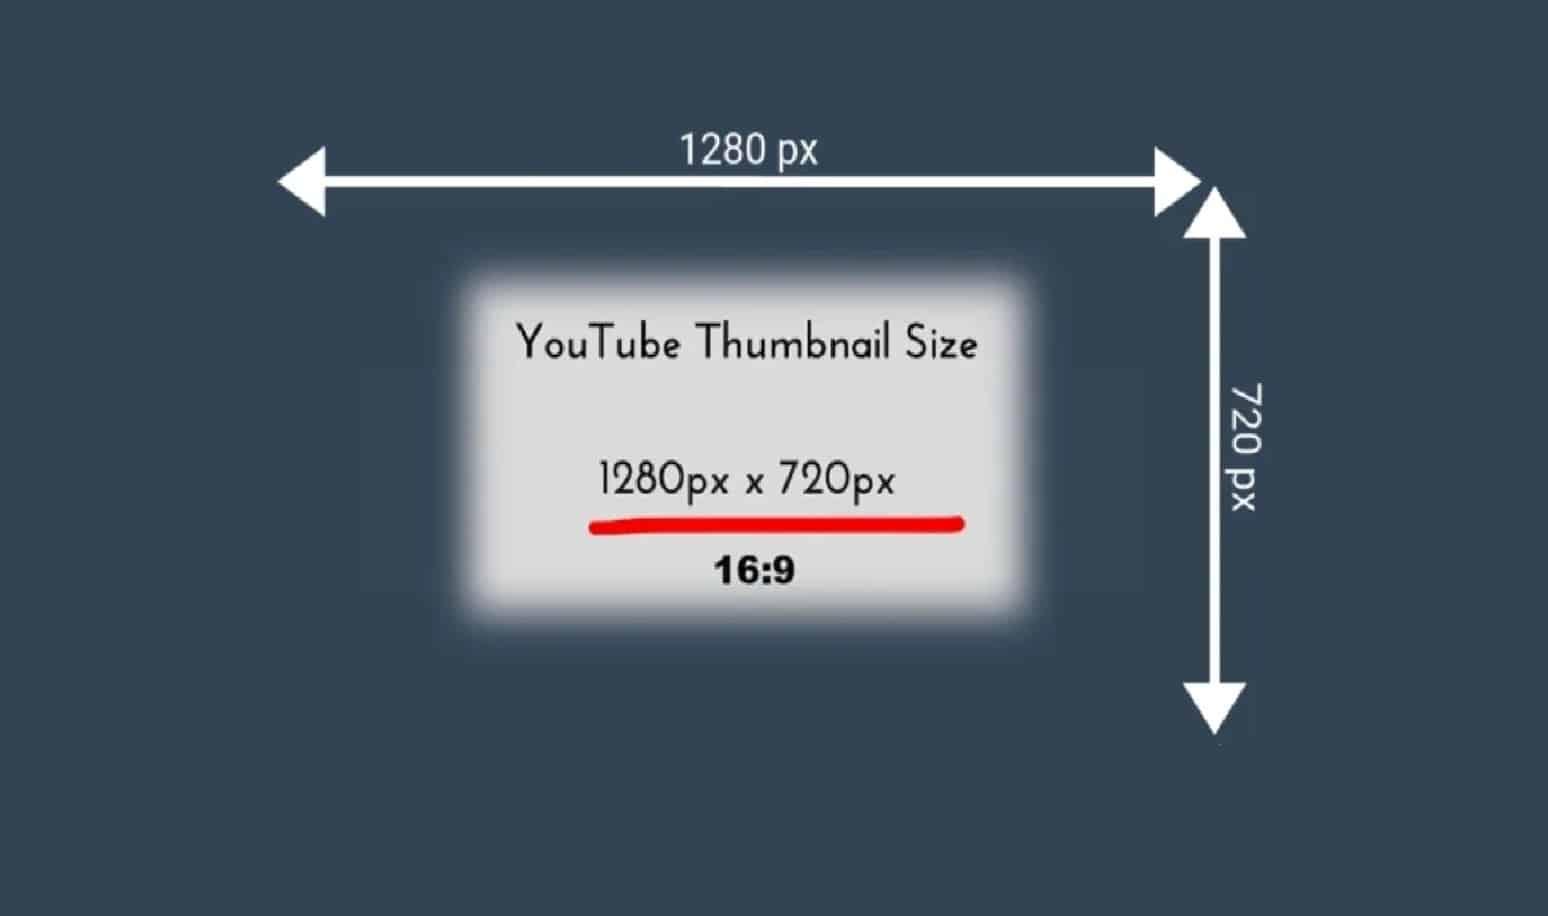 Berapa-Ukuran-Thumbnail-Youtube-yang-Sebaiknya-Digunakan